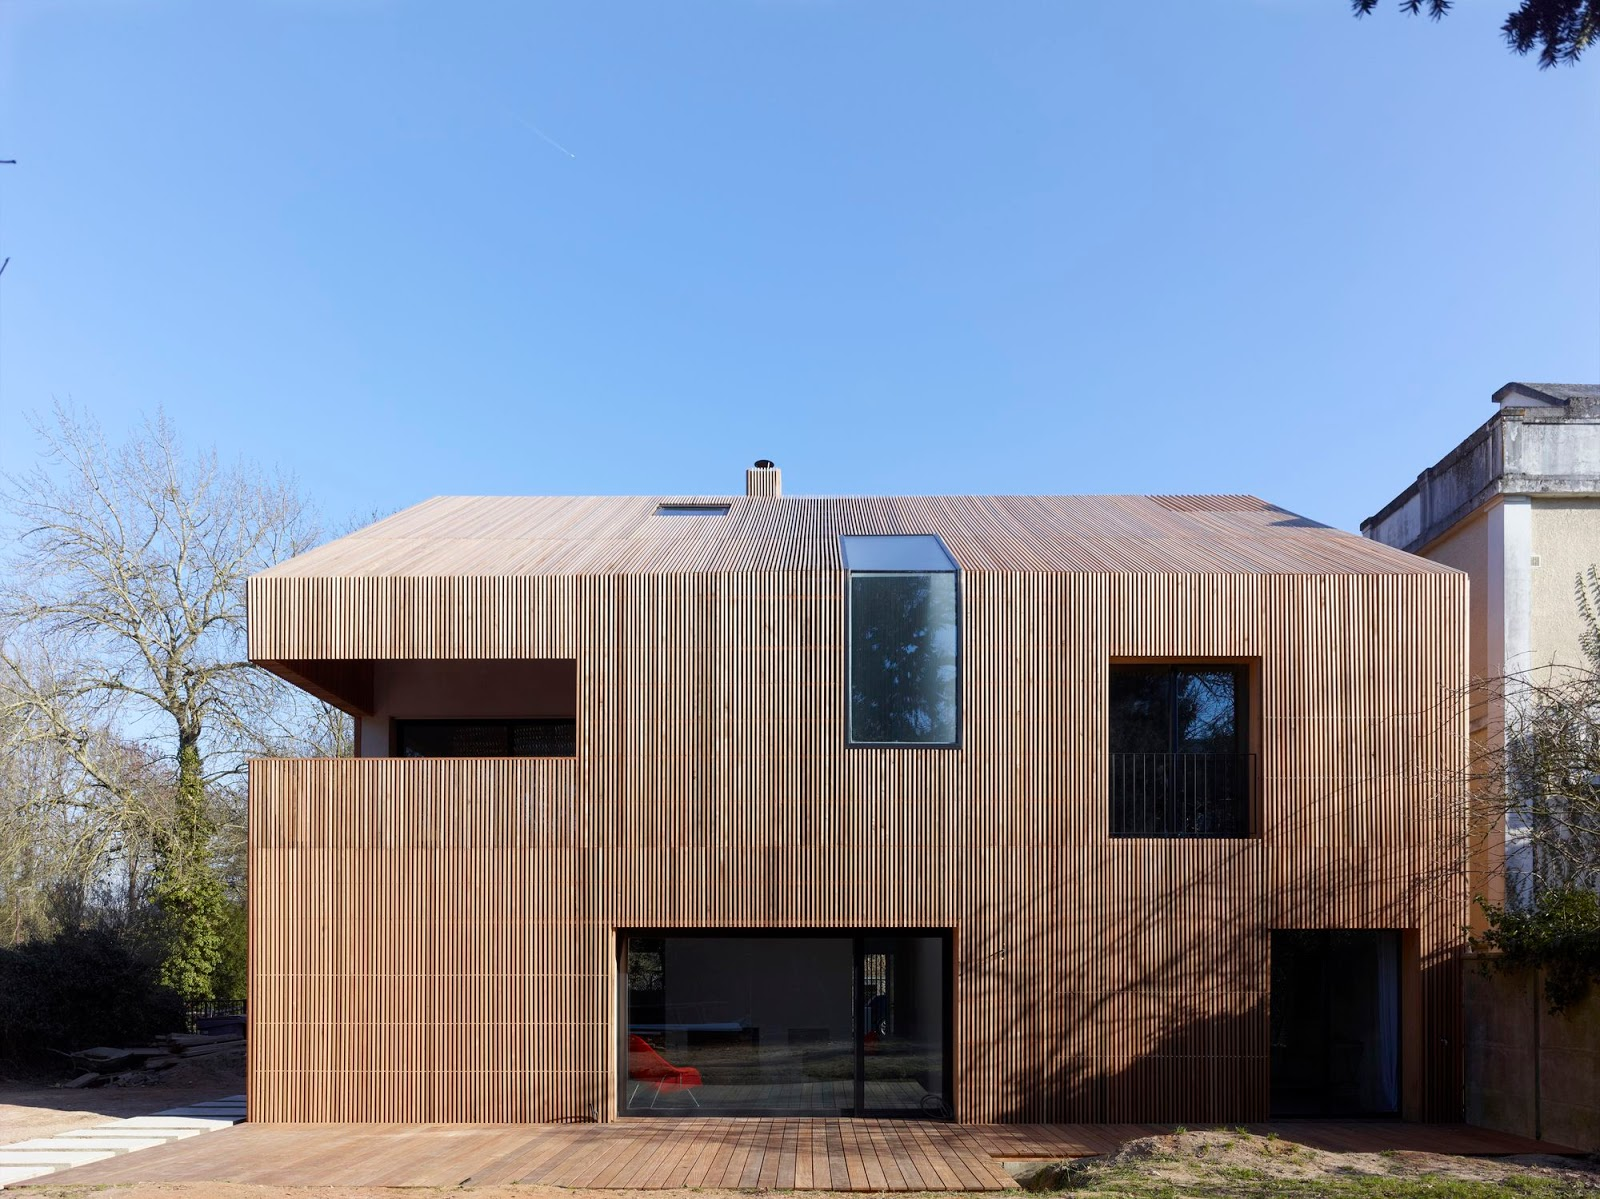 avenier cornejo architectes a f a s i a. Black Bedroom Furniture Sets. Home Design Ideas